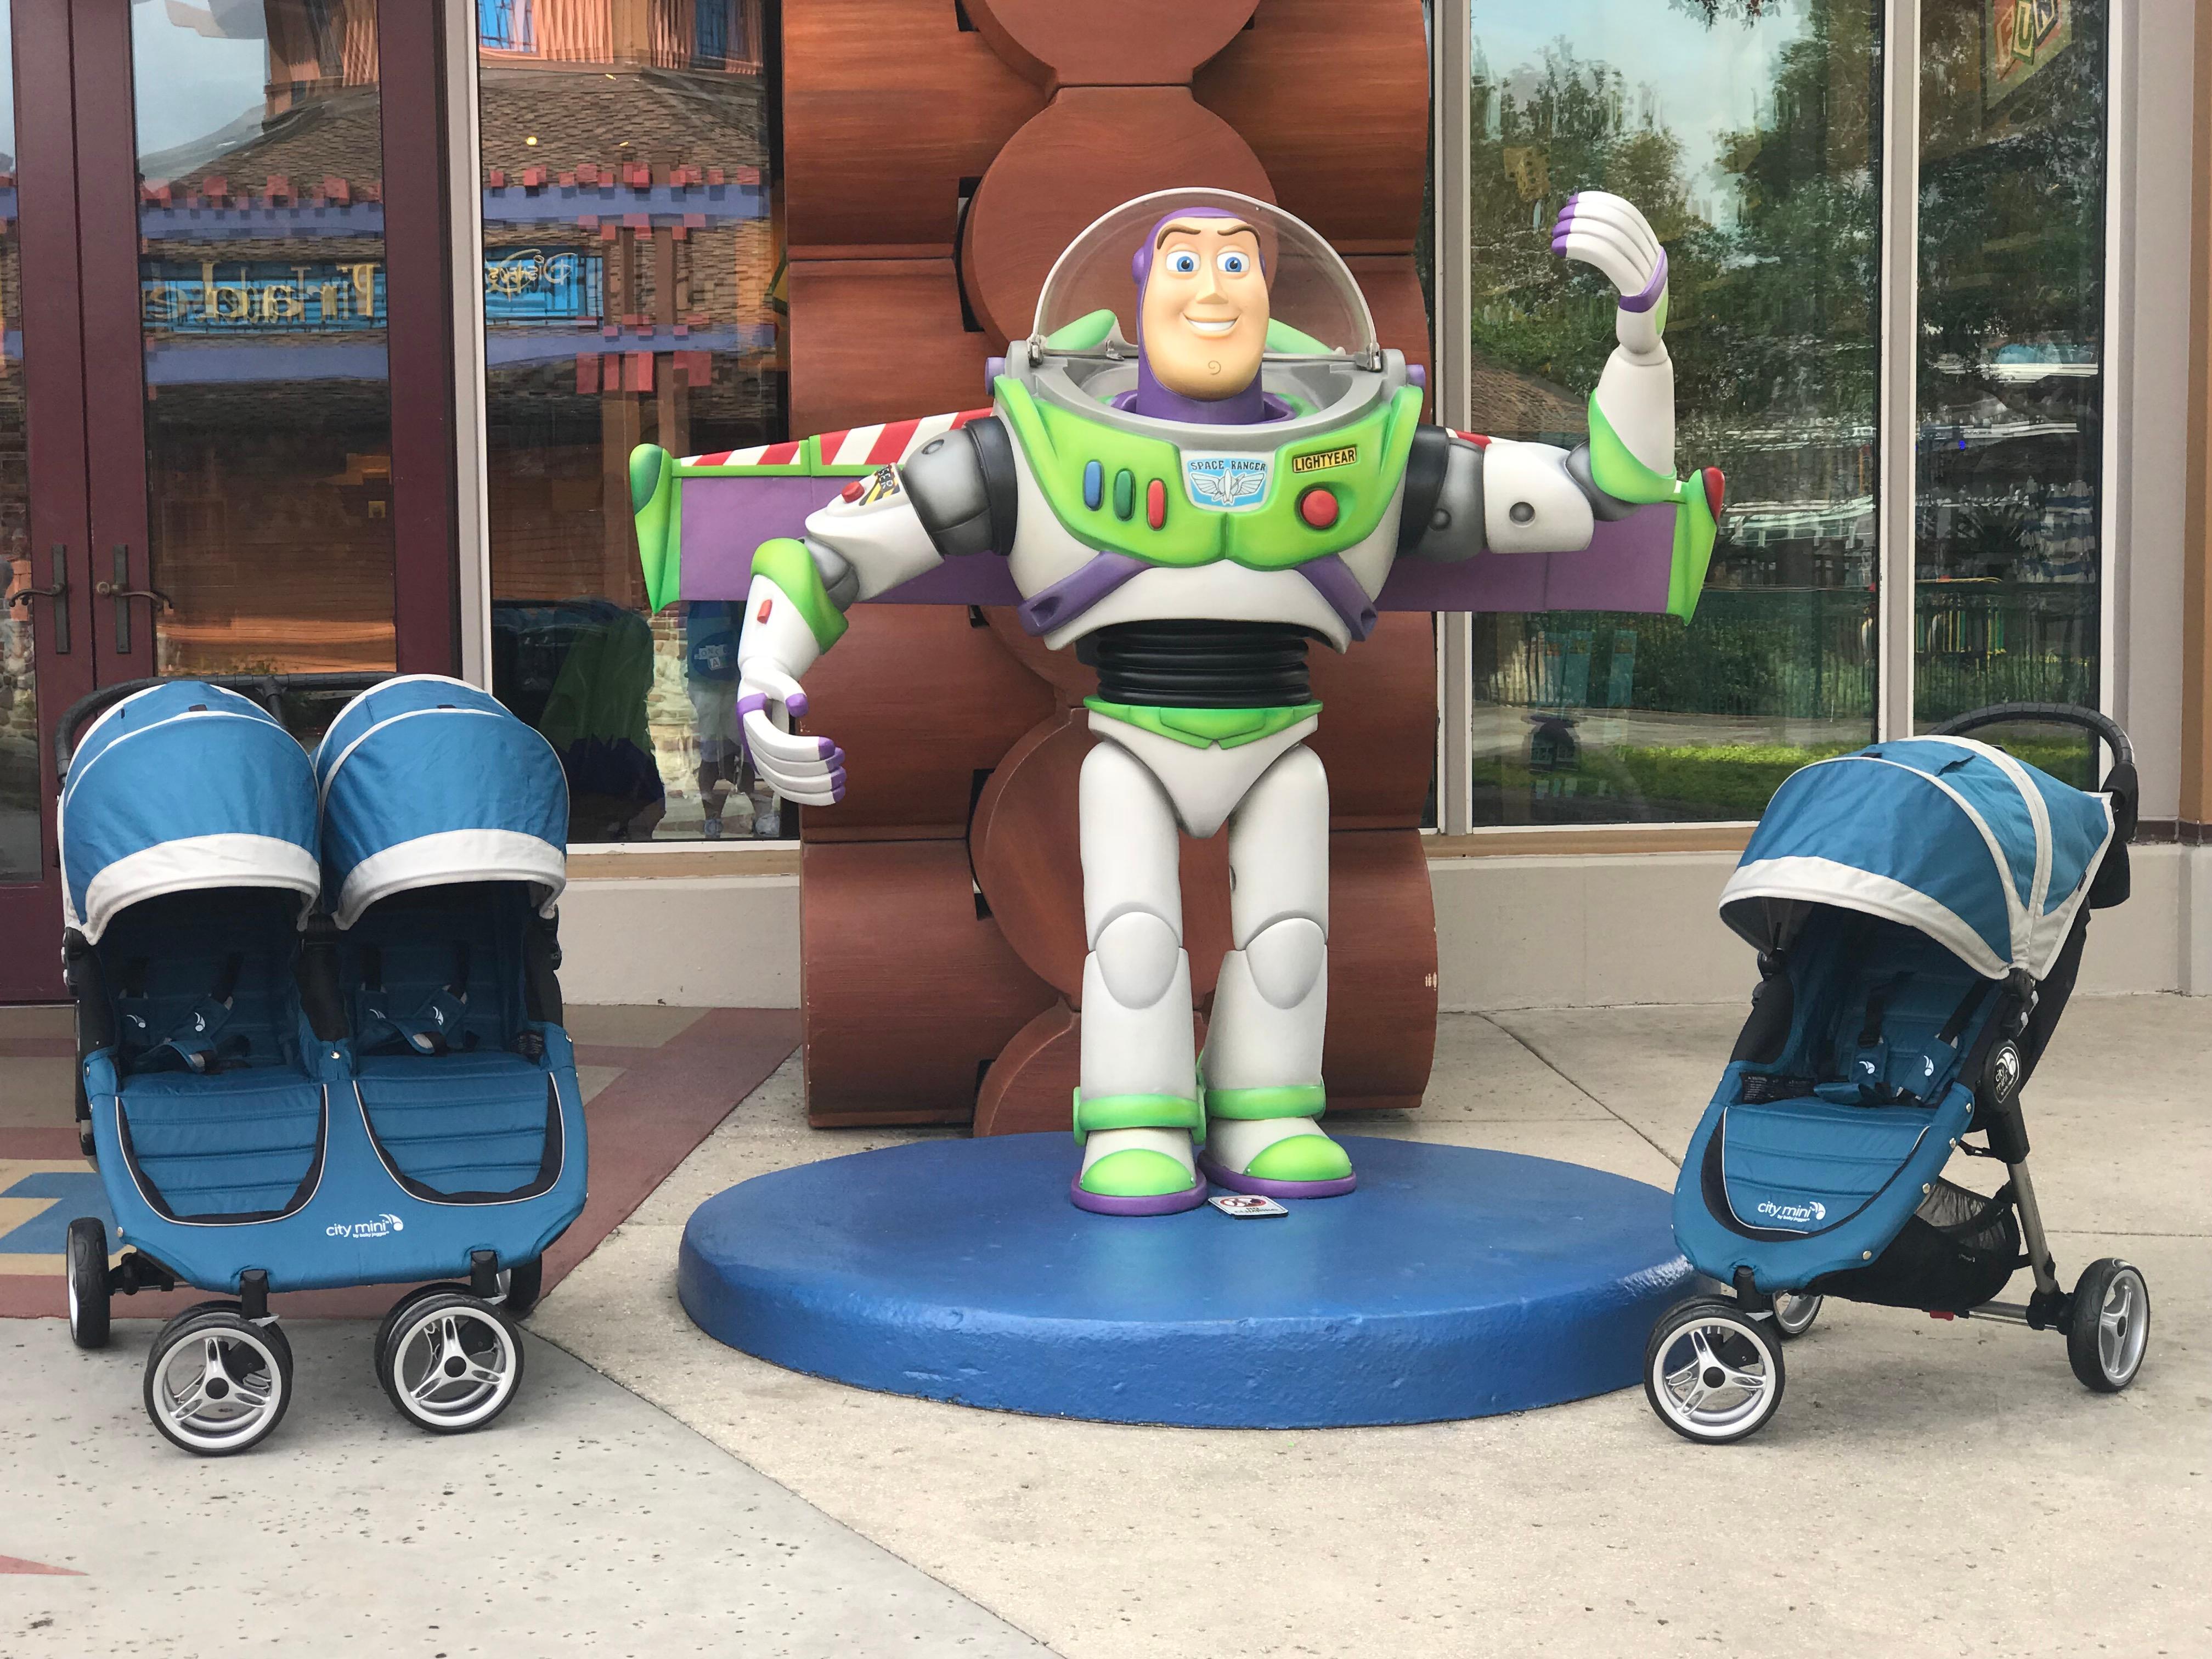 Stroller Rentals Disney image 67